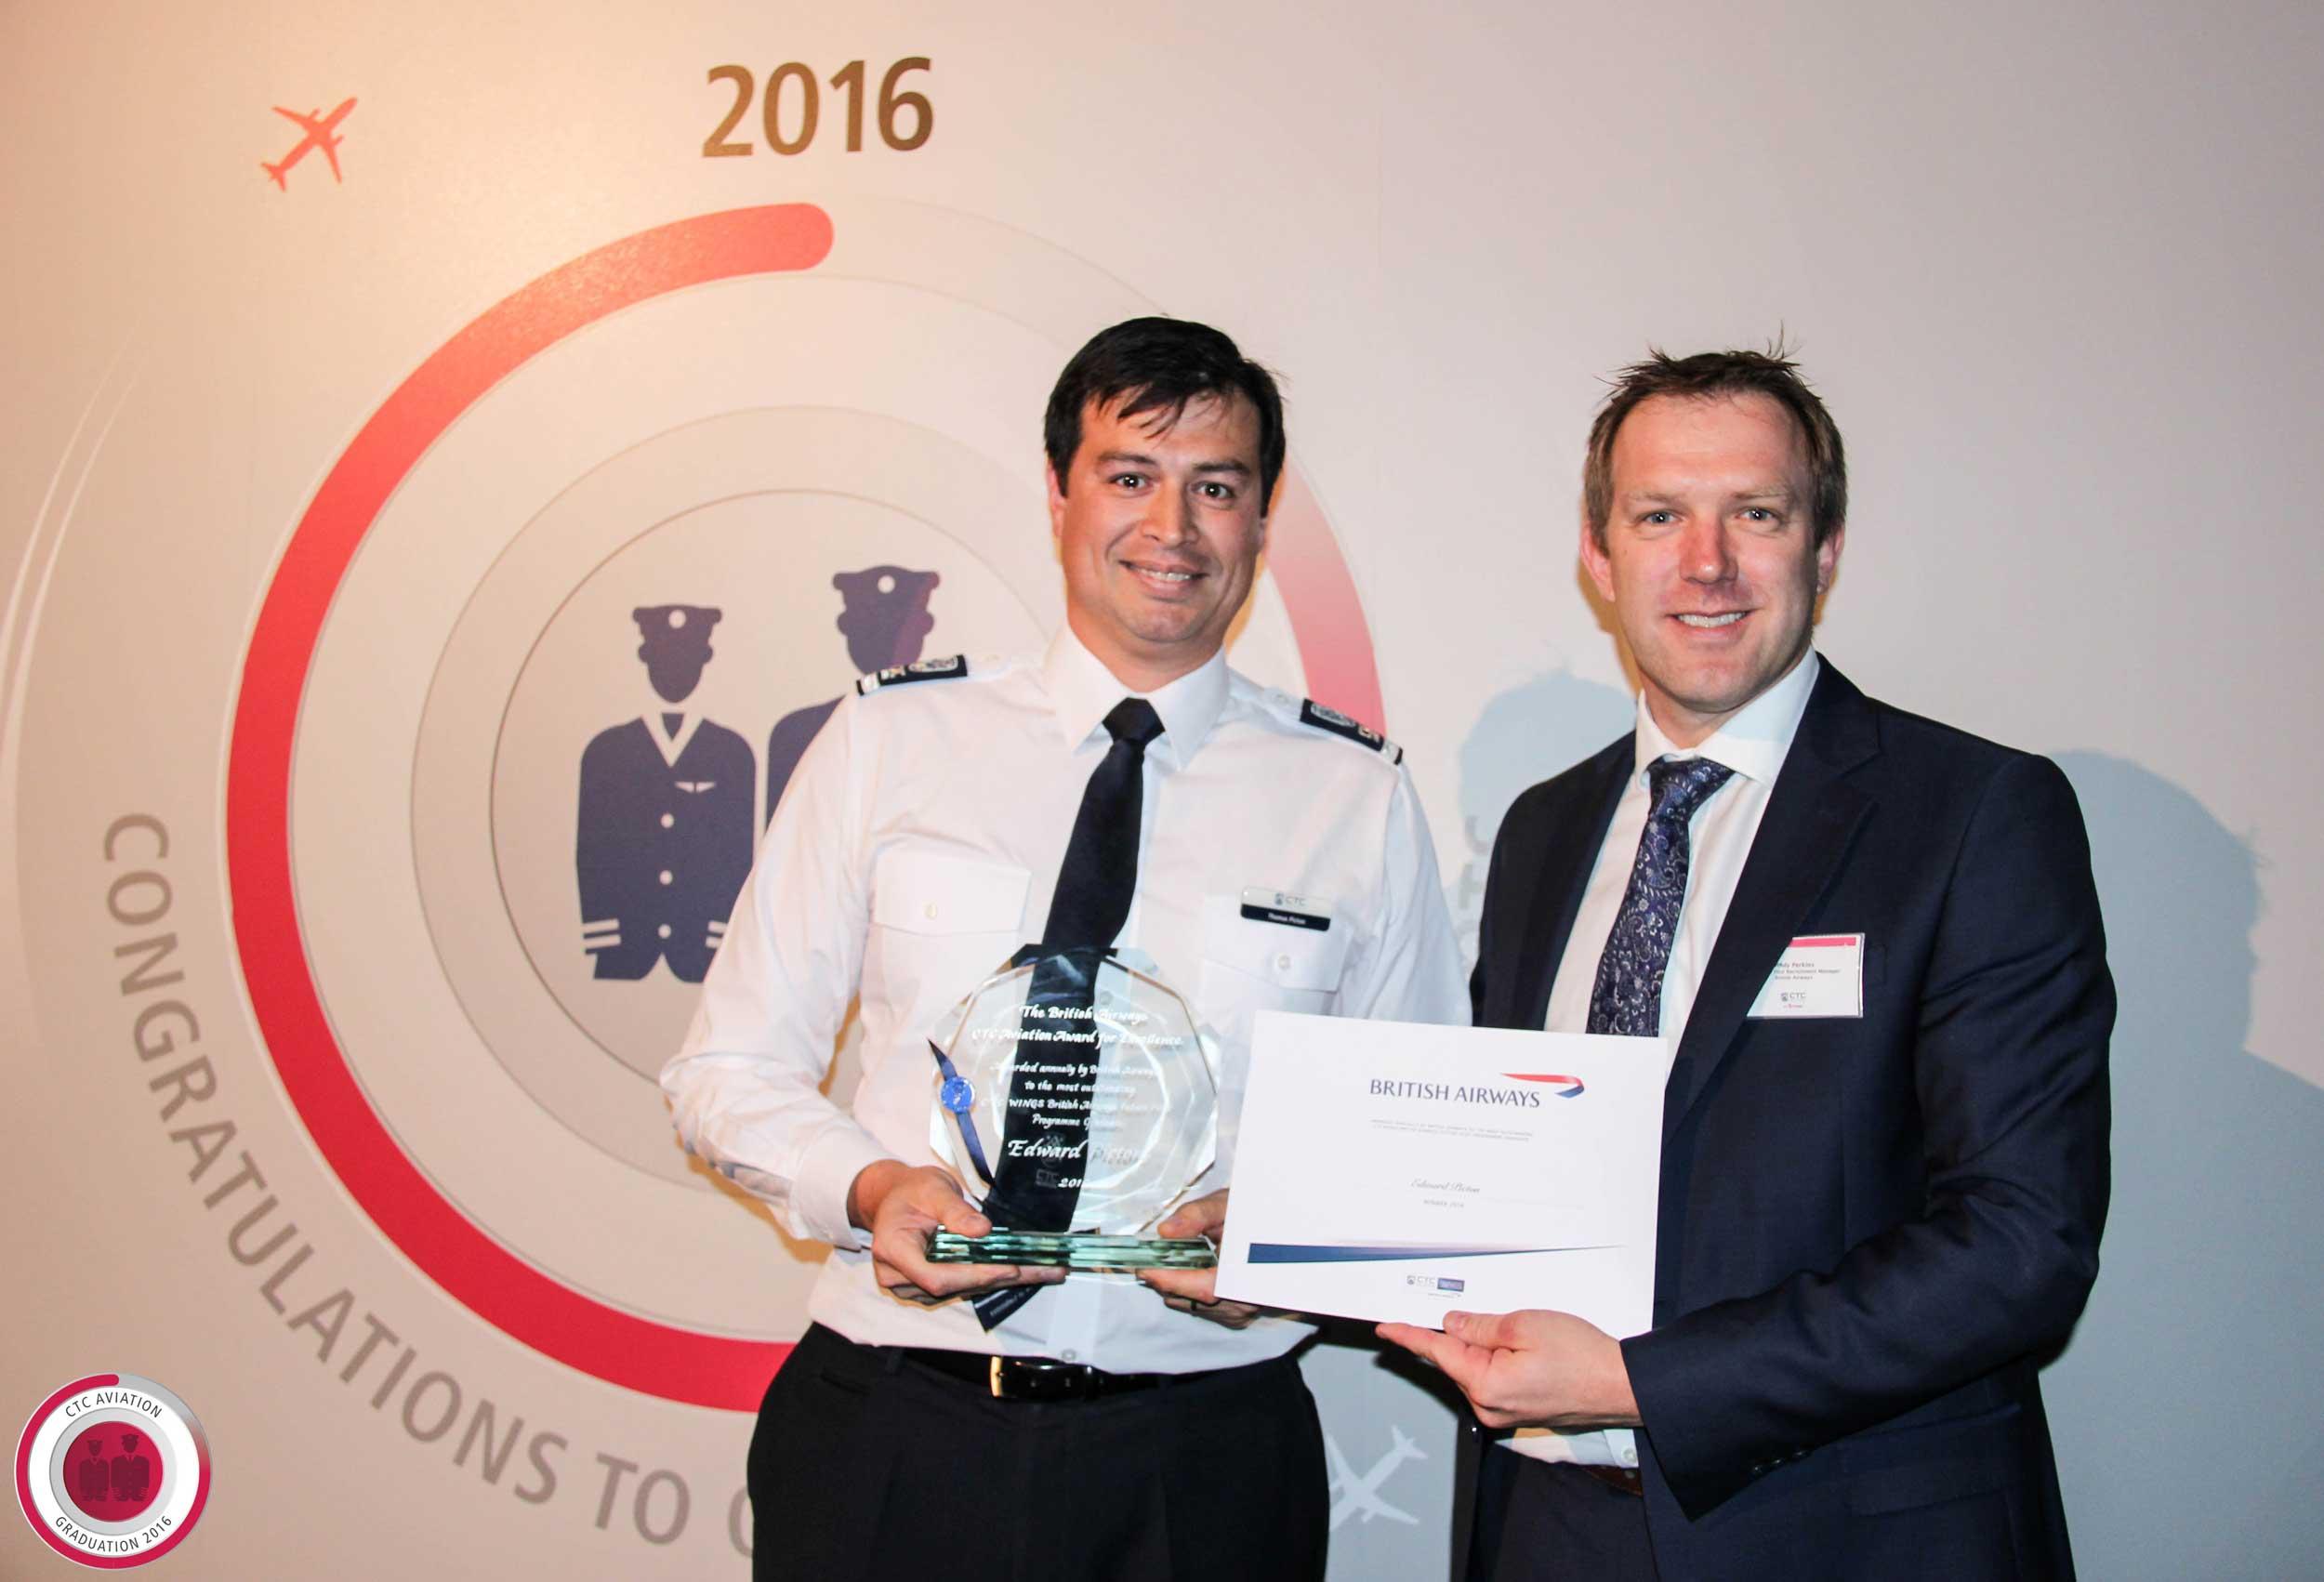 BA award winner Edward Picton, left, and BA pilot recruitment manager Andrew Perkins.